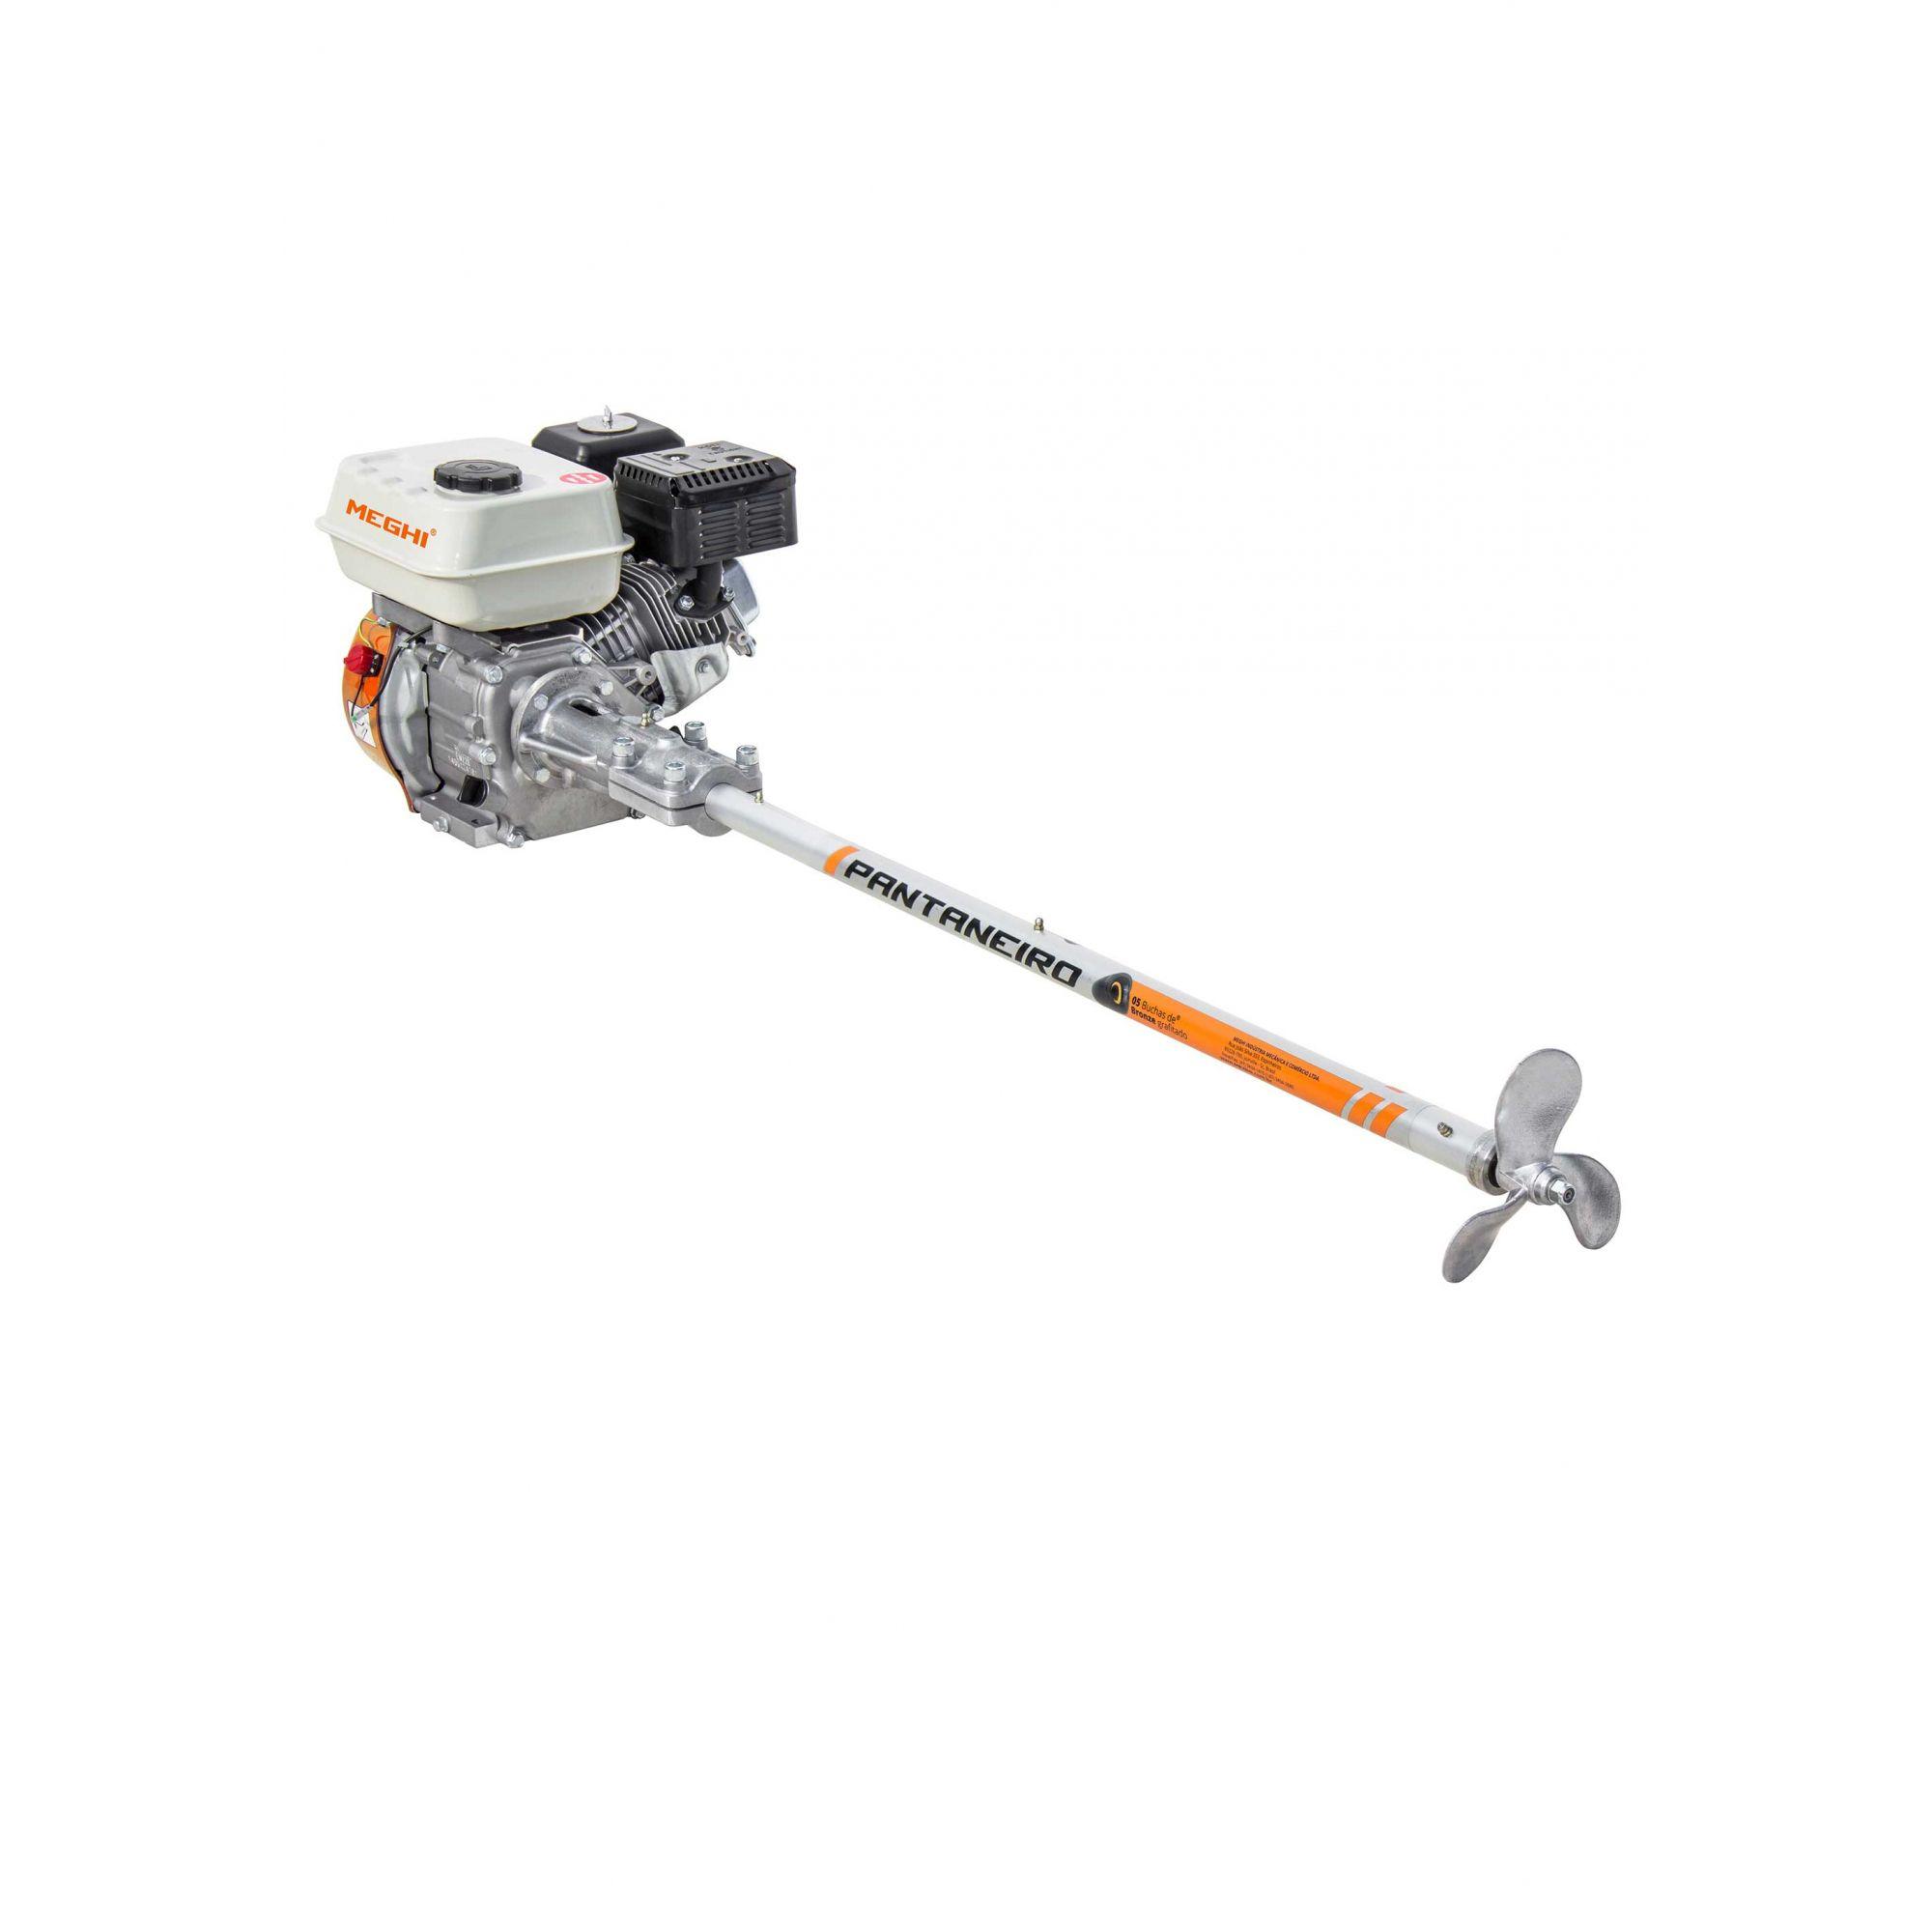 Kit Motor De Centro Barco Bote 1,20mt Motor 15/20hp Gasolina